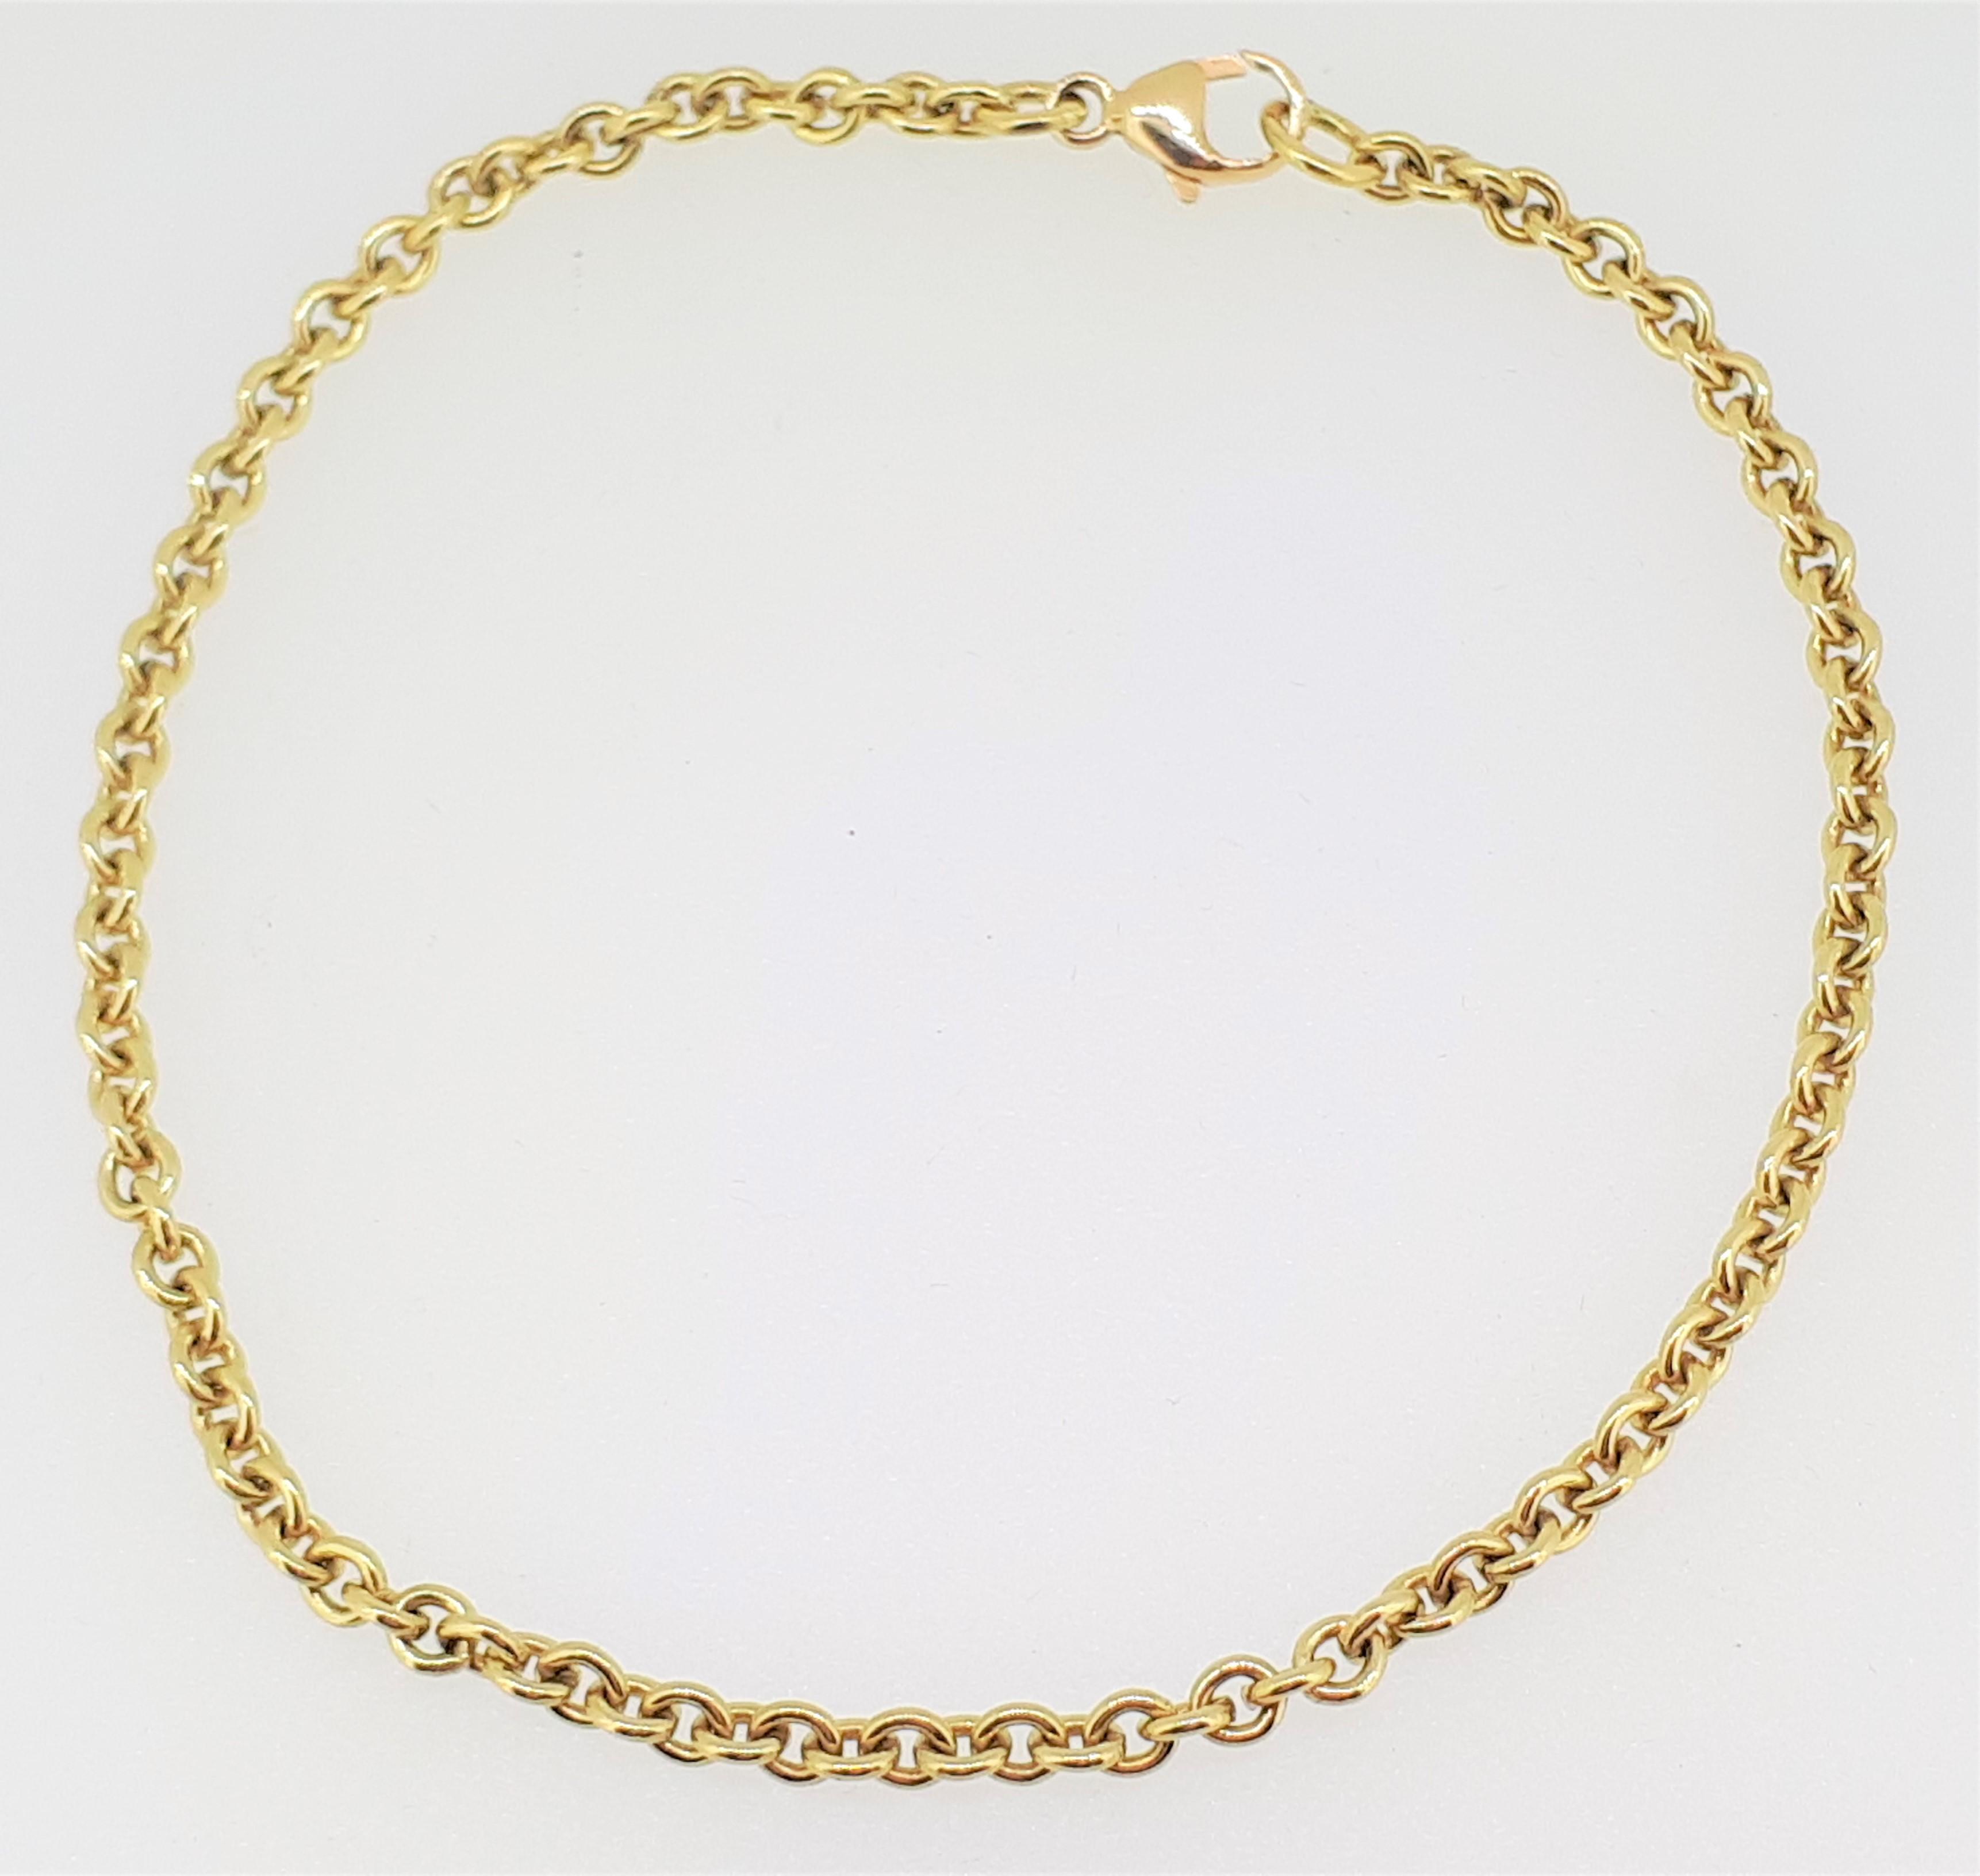 "18ct Yellow Gold (750) Round Belcher Bracelet - 7.5"" / 19cm - Image 2 of 2"